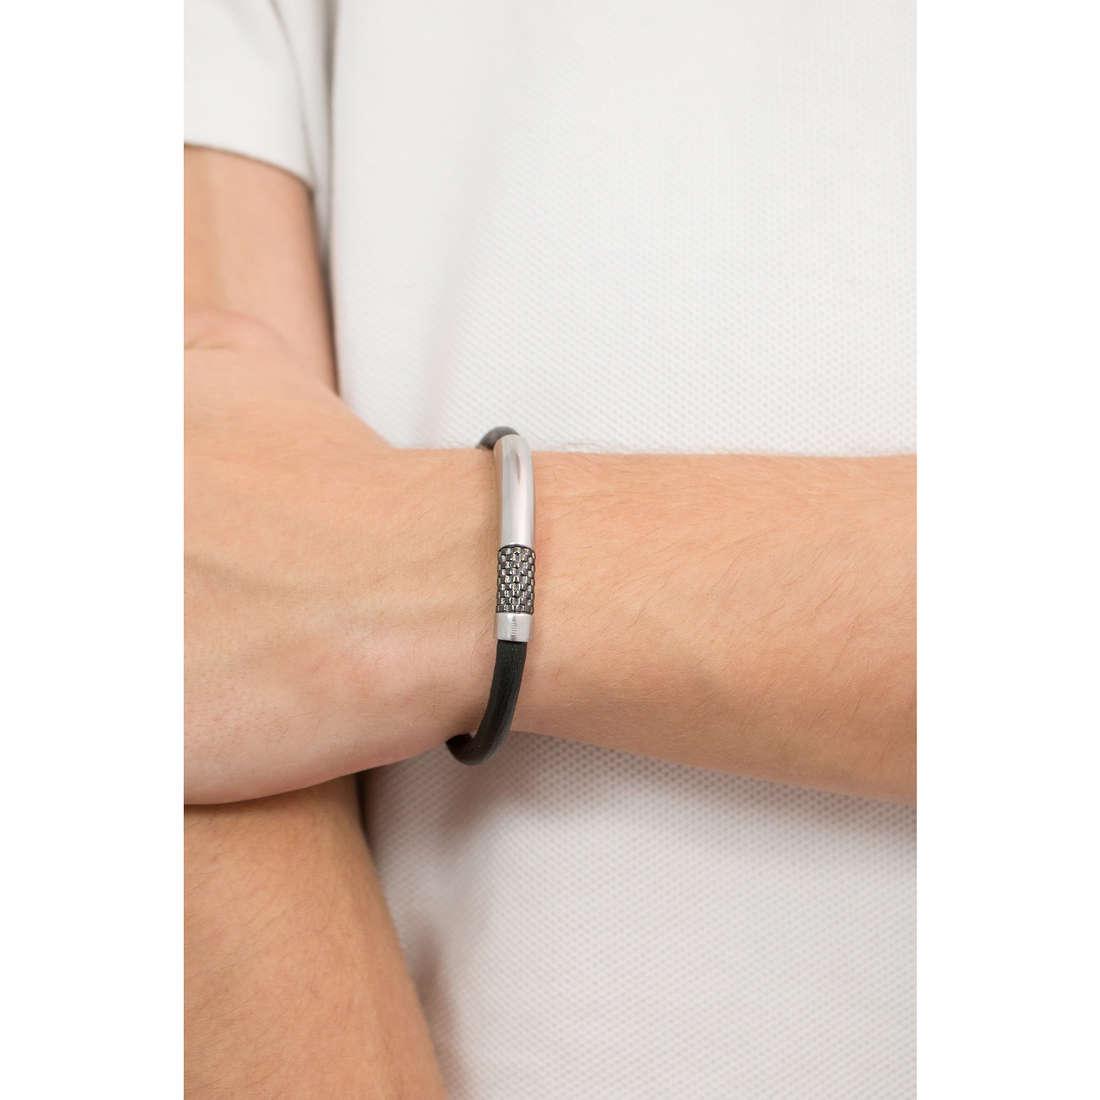 Emporio Armani bracelets man EGS2385020 photo wearing